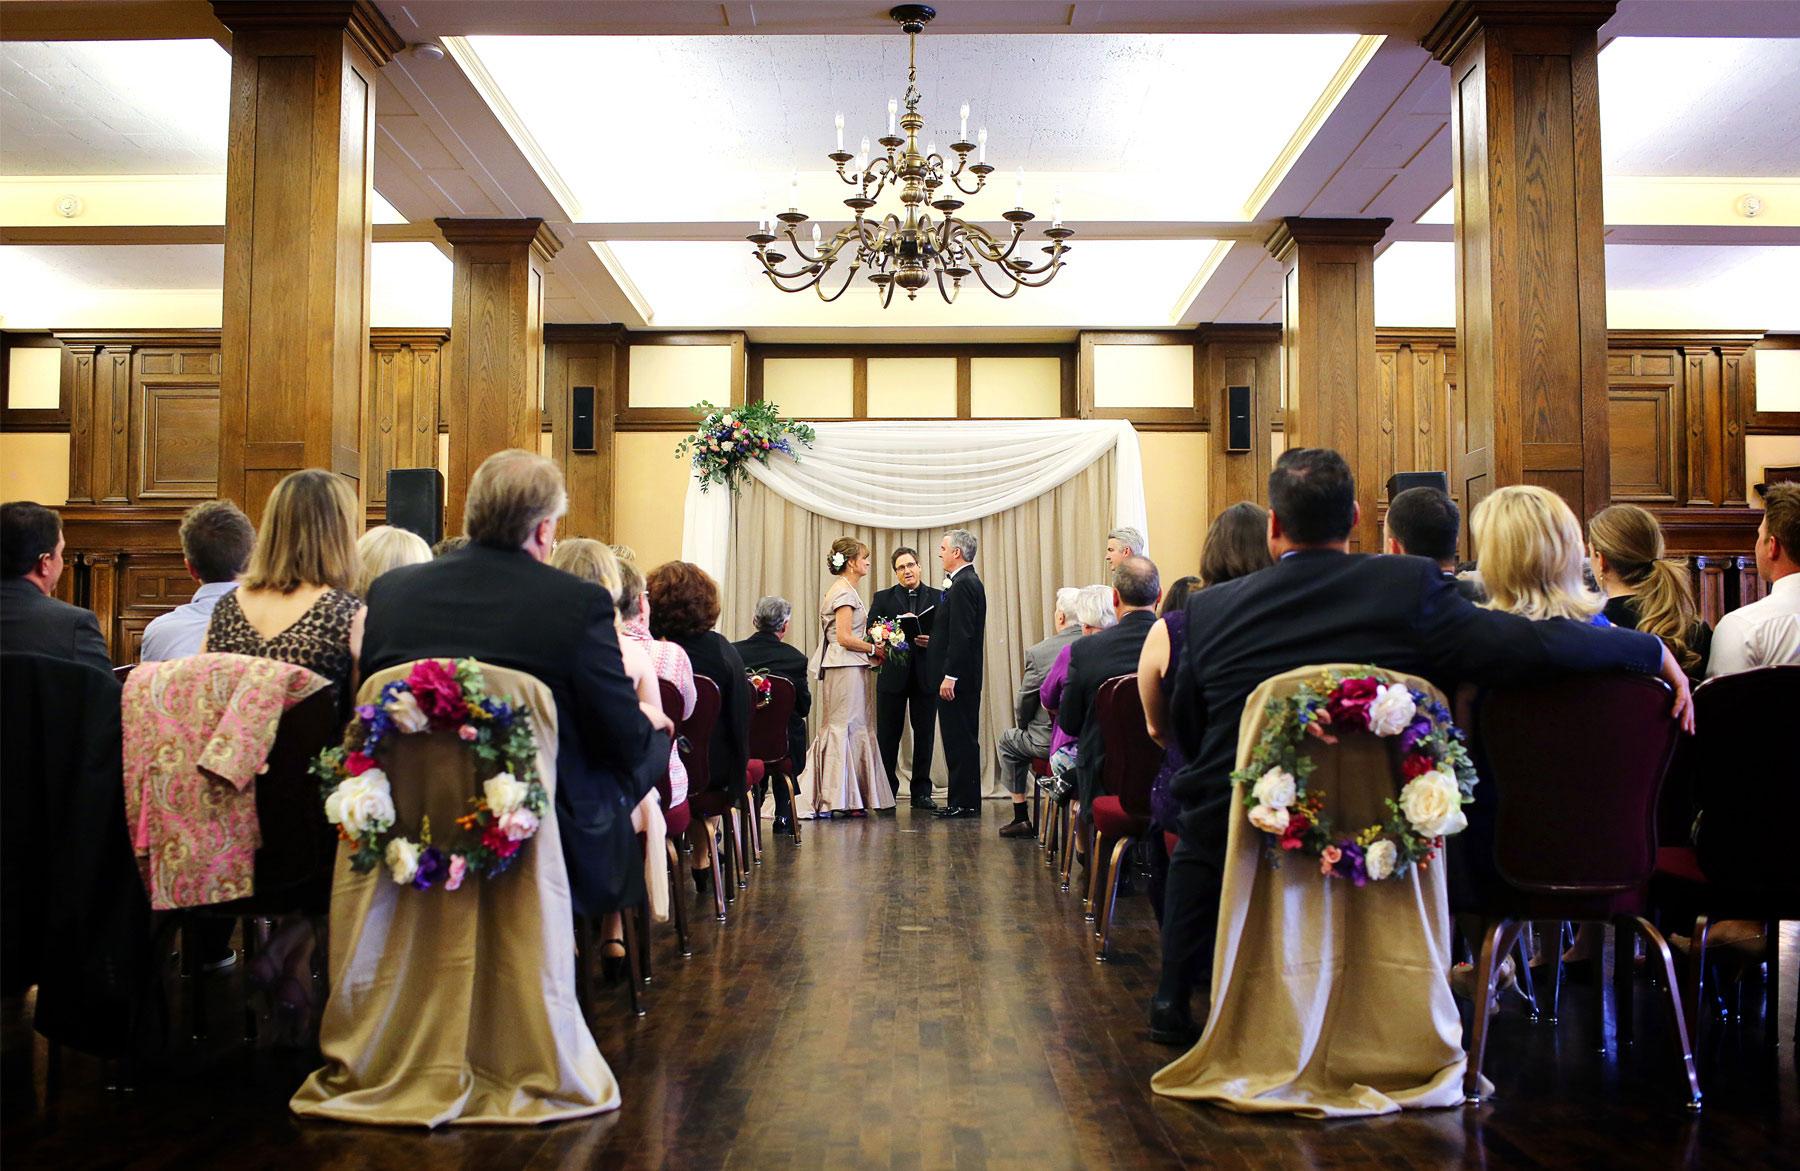 08-Minneapolis-Minnesota-Wedding-Photography-by-Vick-Photography-Downtown-The-Minneapolis-Club-Mansion-Ceremony-Tonia-and-Paul.jpg